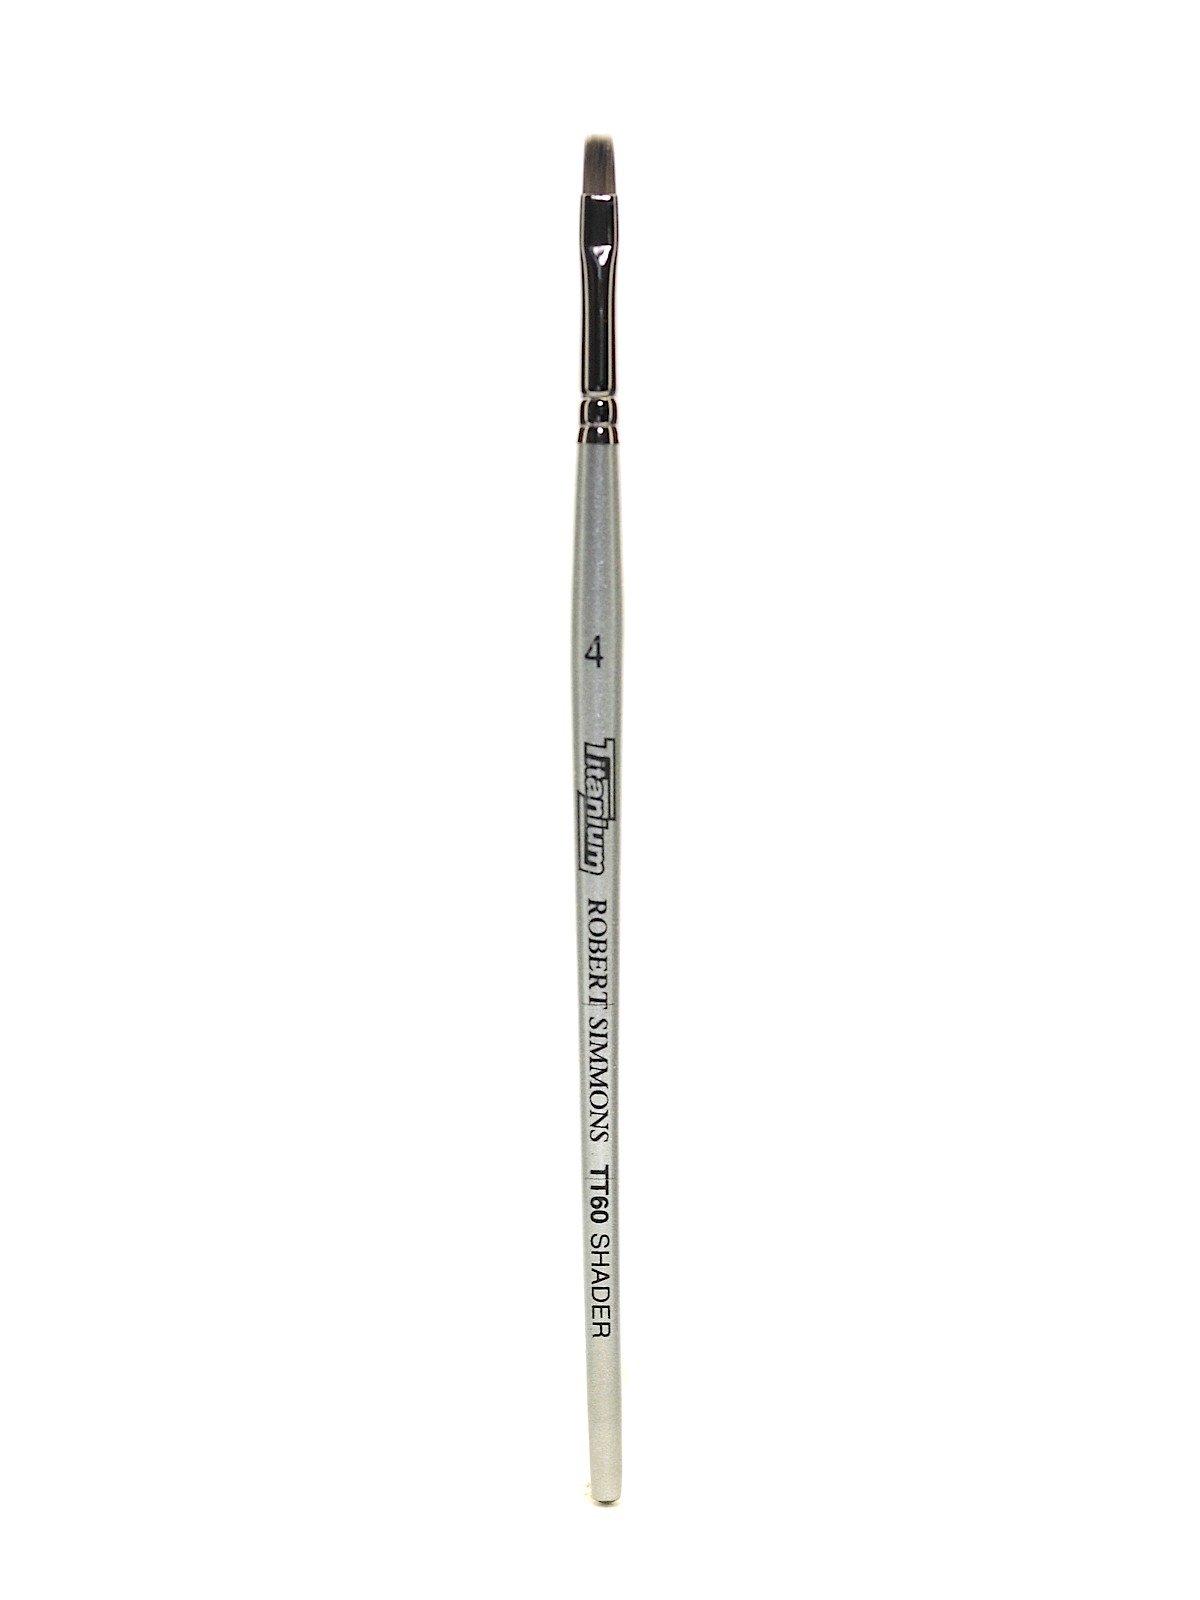 Robert Simmons Titanium Brushes Short Handle Single Stock 4 flat shader TT60 [PACK OF 2 ]